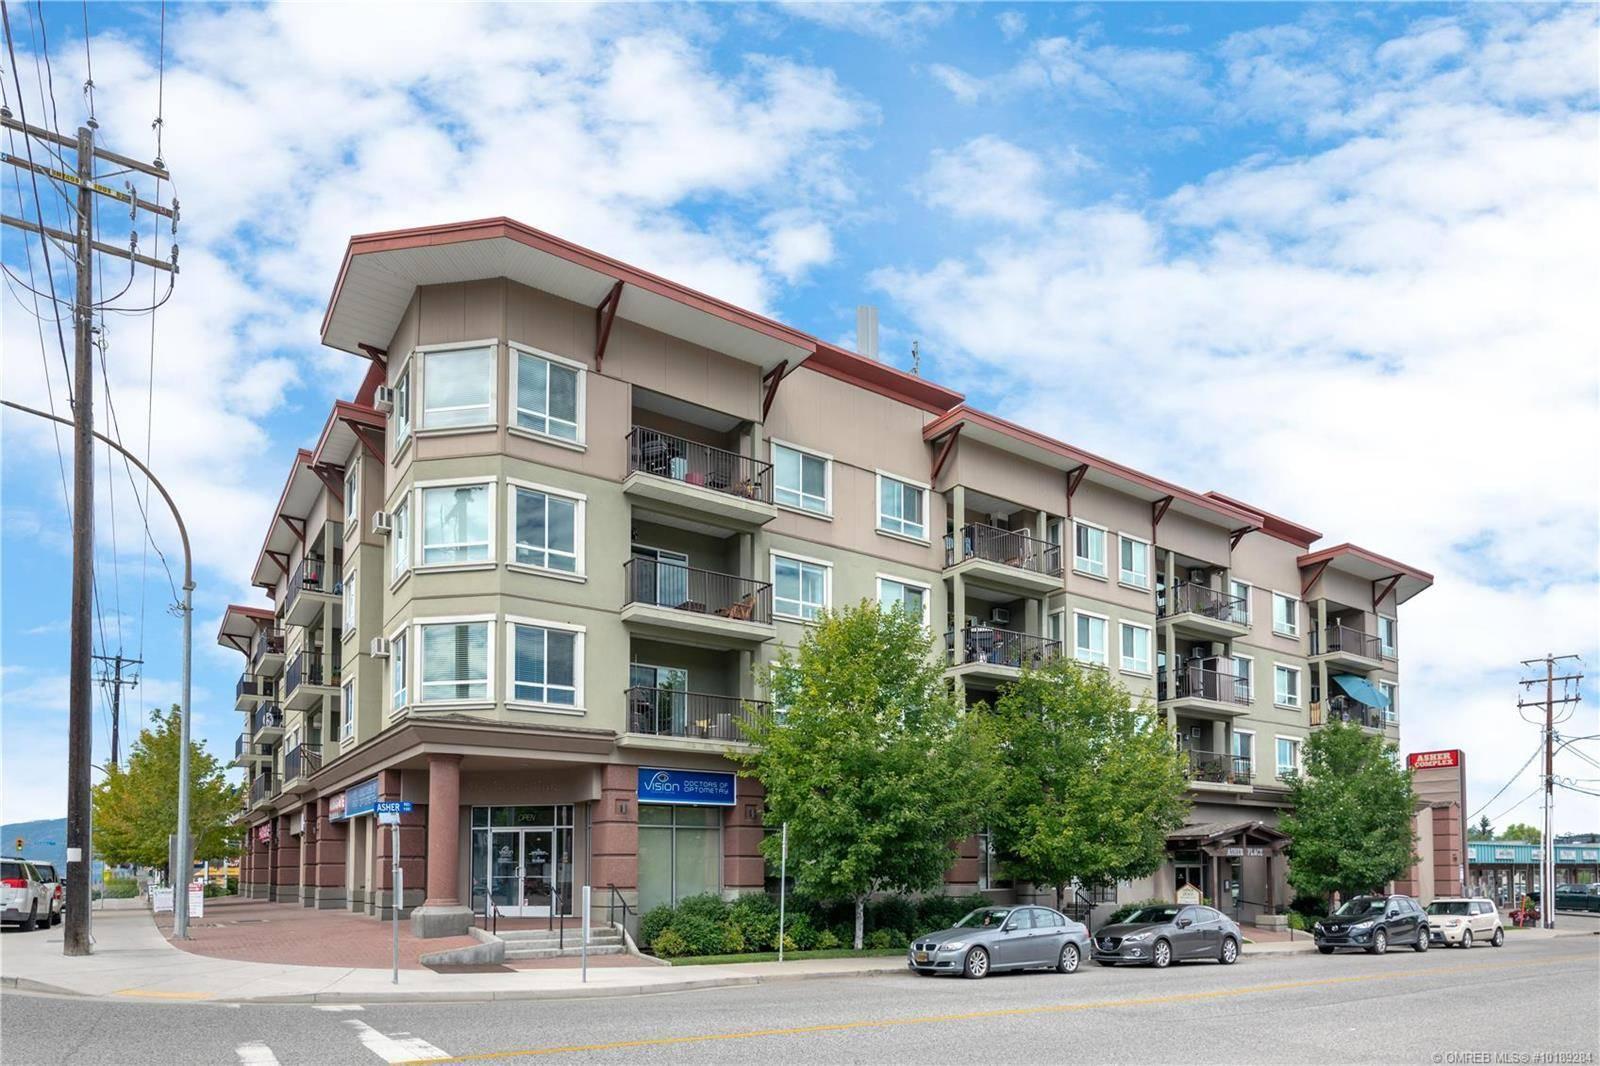 Condo for sale at 140 Asher Rd Unit 402 Kelowna British Columbia - MLS: 10189284